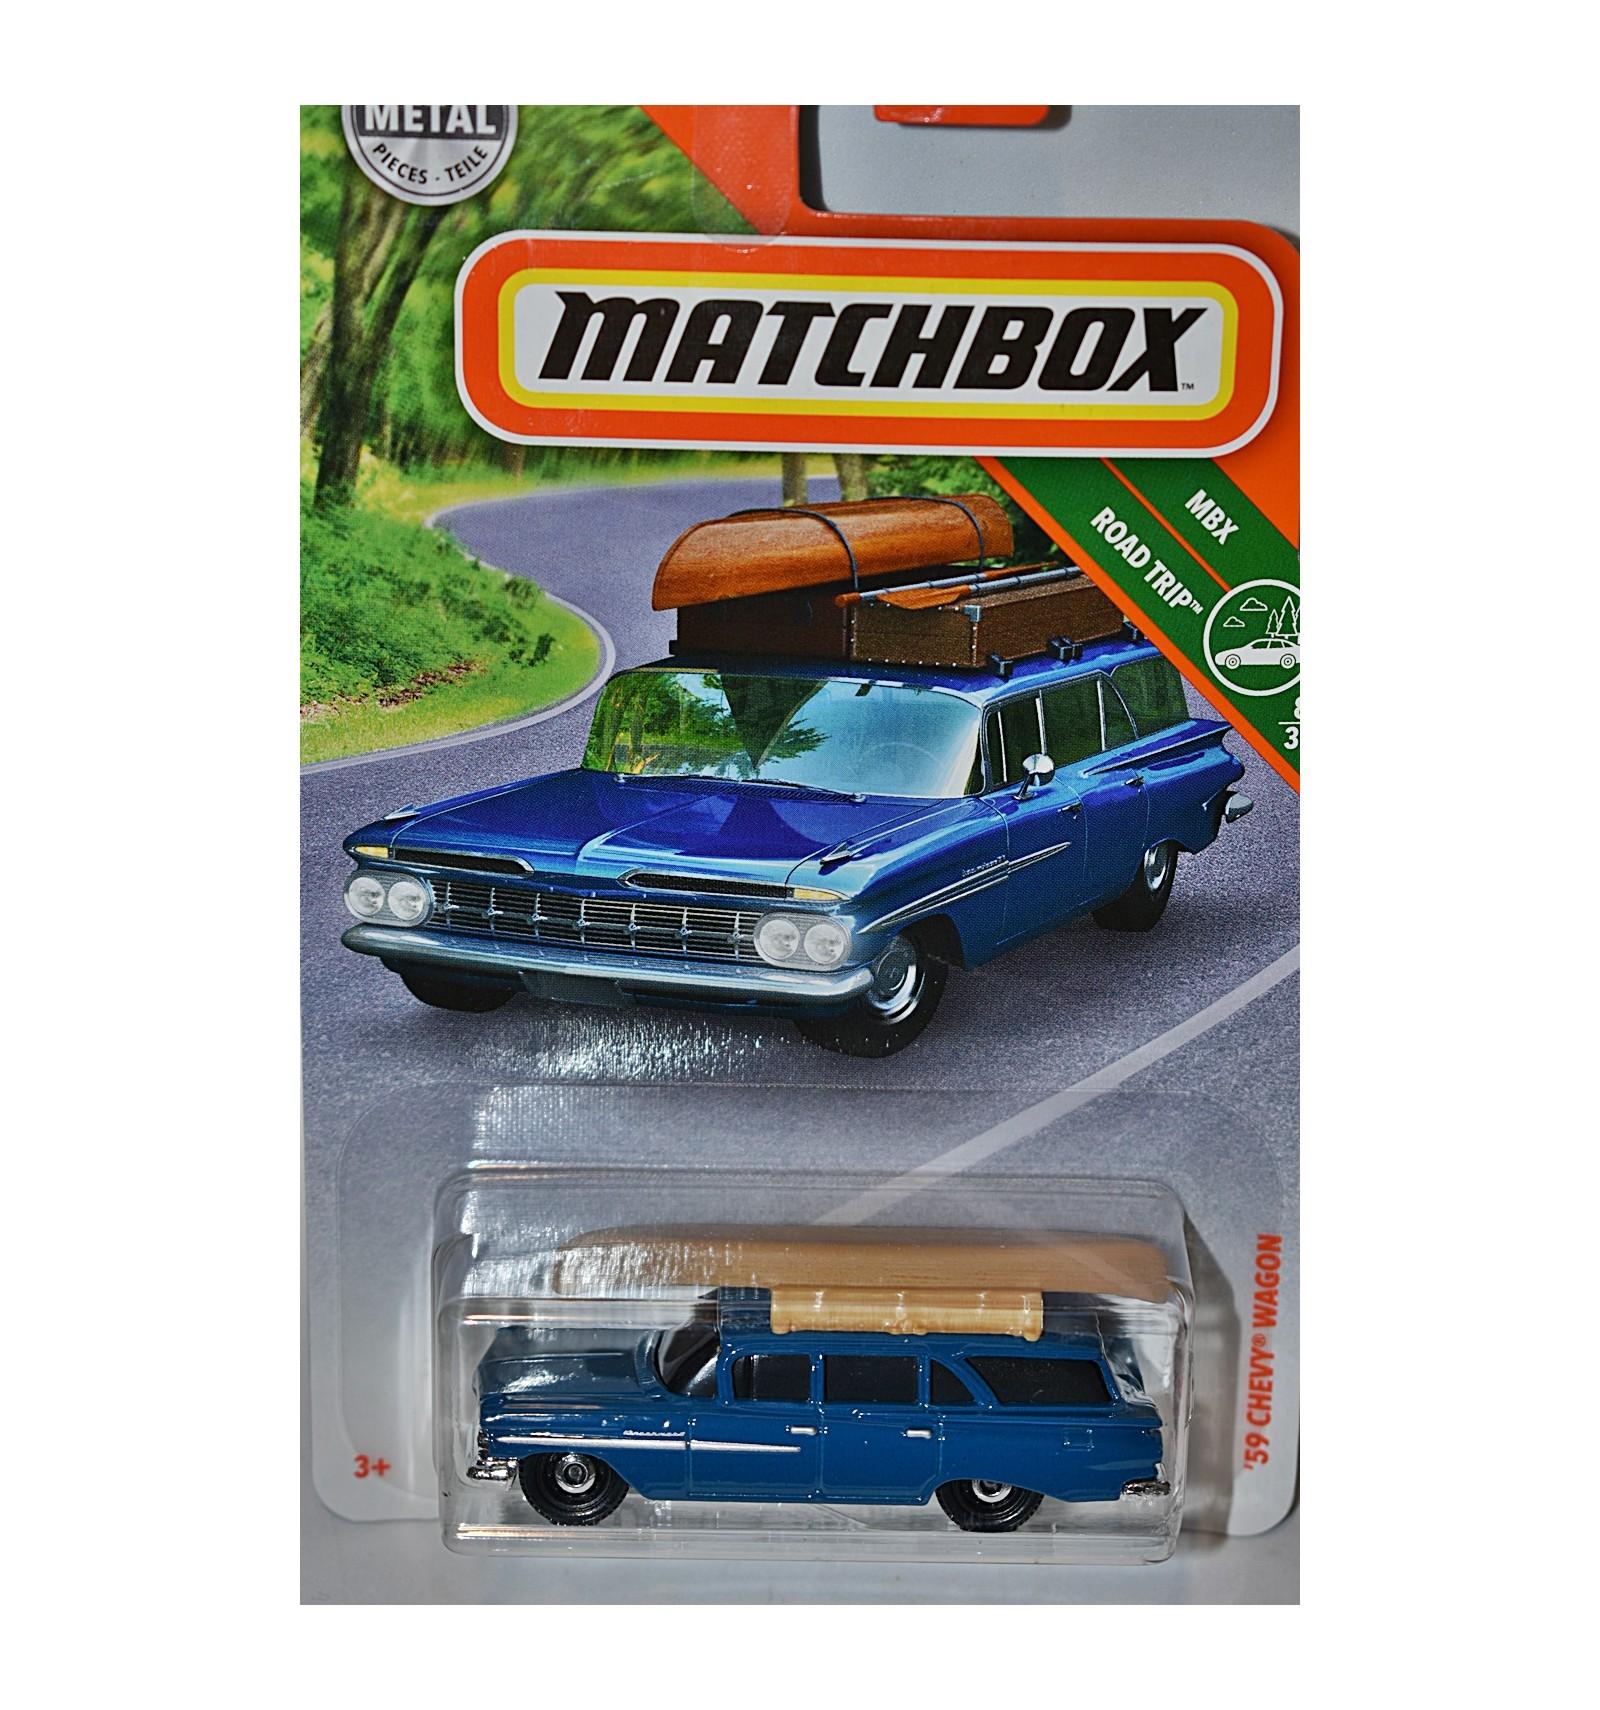 Matchbox 1959 Chevrolet Brookwood Station Wagon